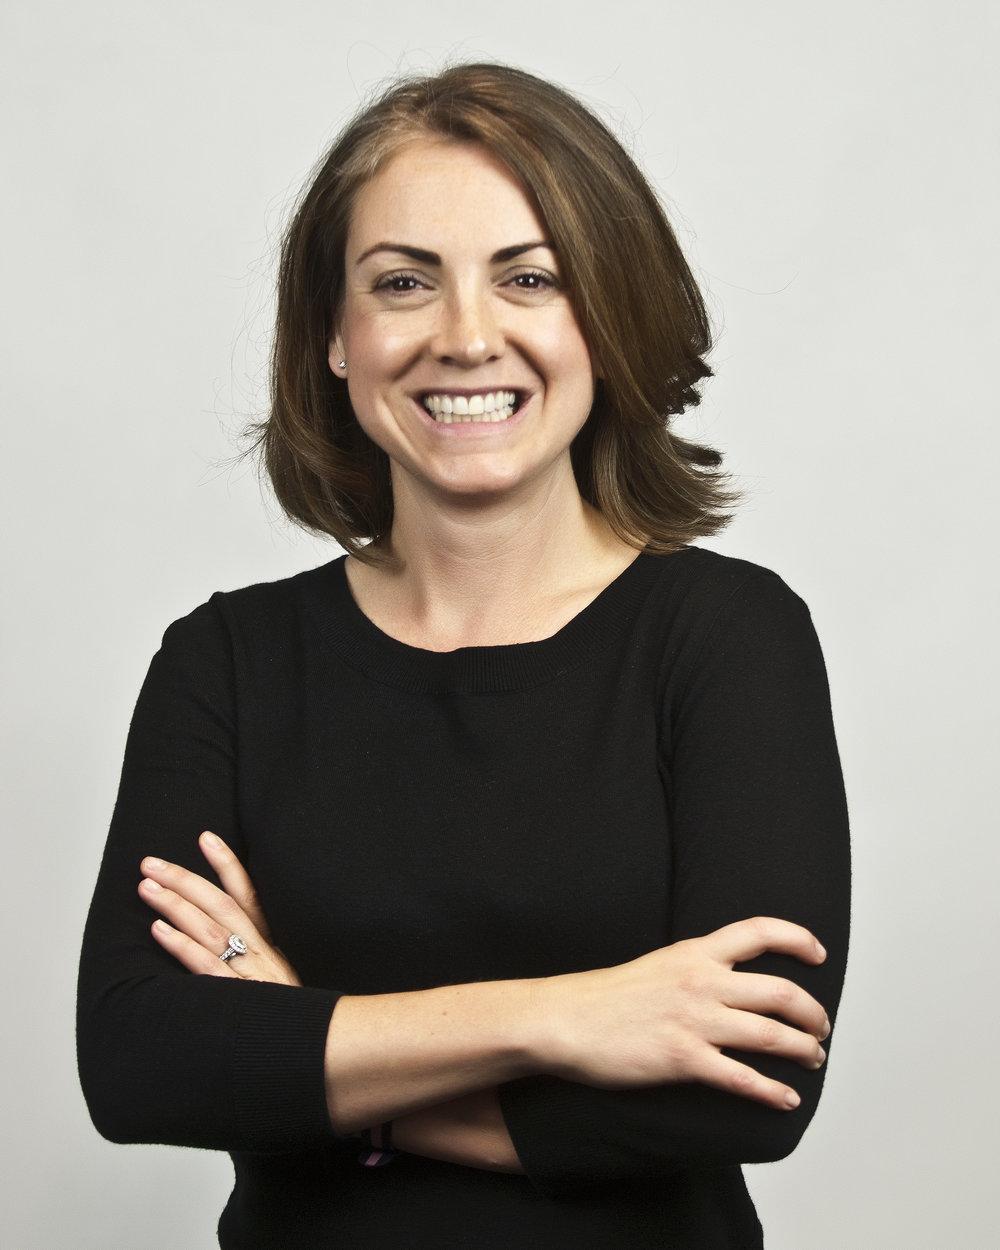 Megan Bigelow |BoardPresident & Co-Founder |Events & Volunteers Manager, Customer Support @ Jama Software